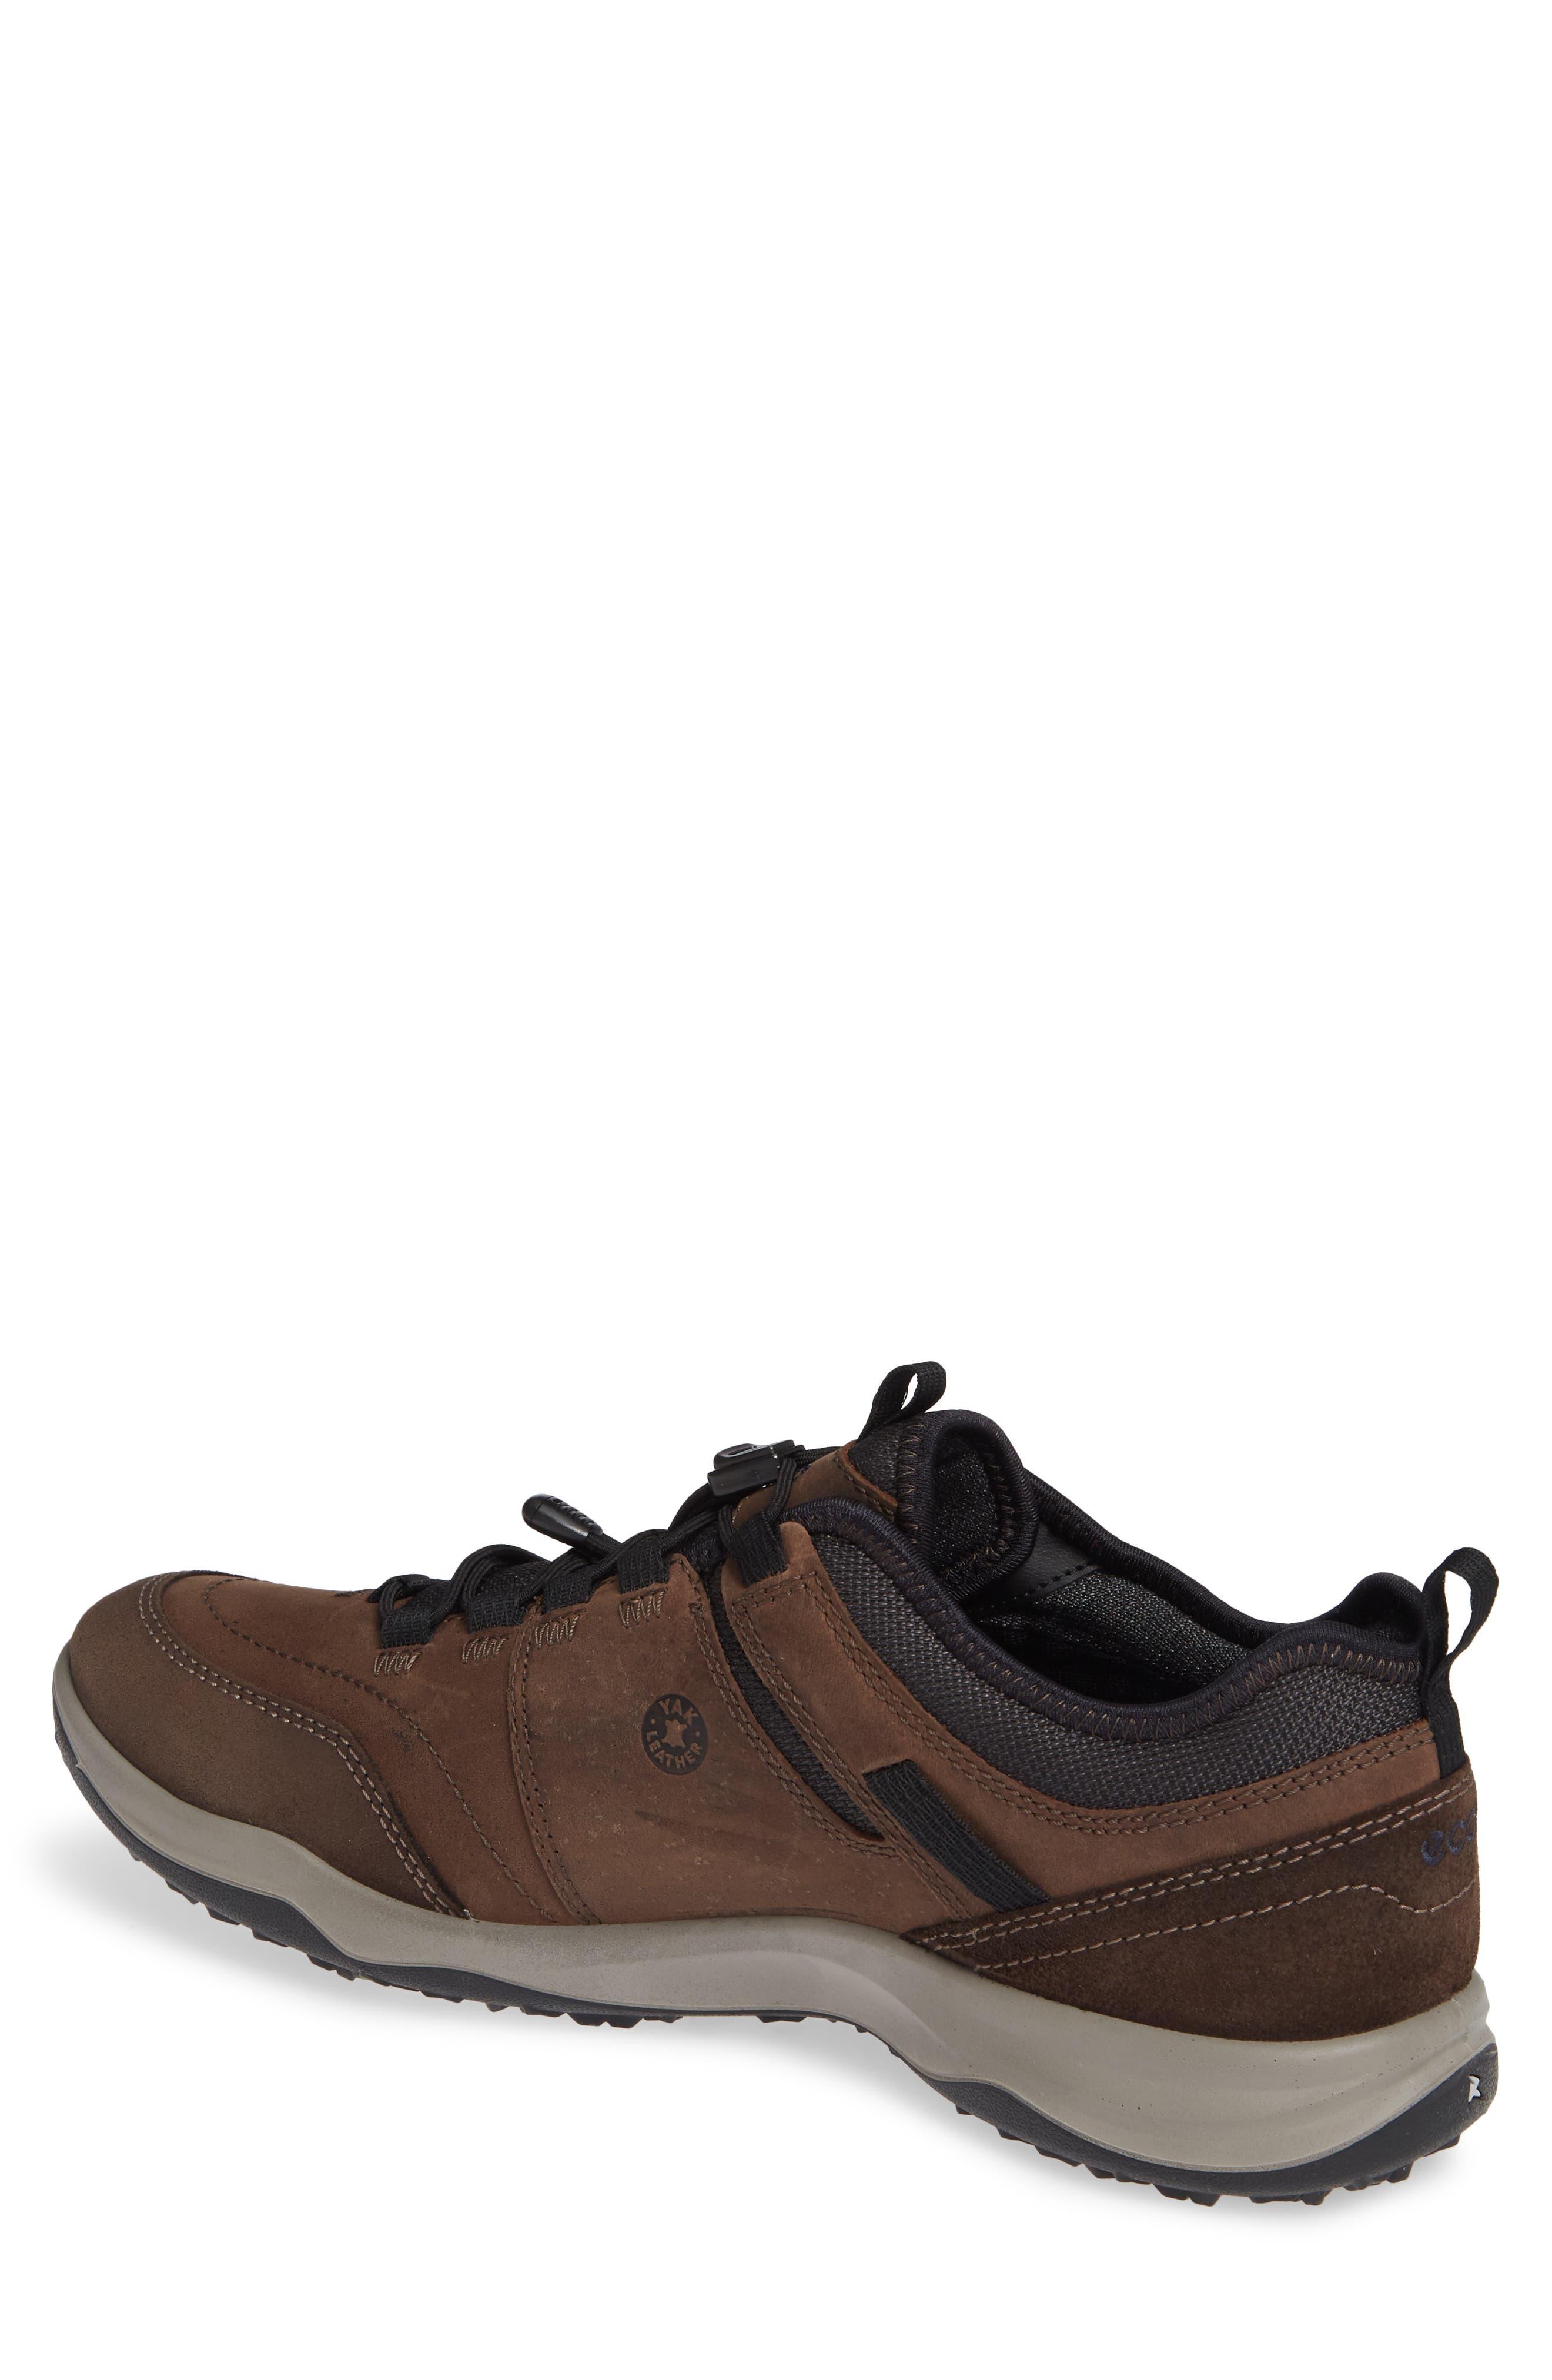 'Espinho GTX' Sneaker,                             Alternate thumbnail 2, color,                             ESPRESSO NUBUCK